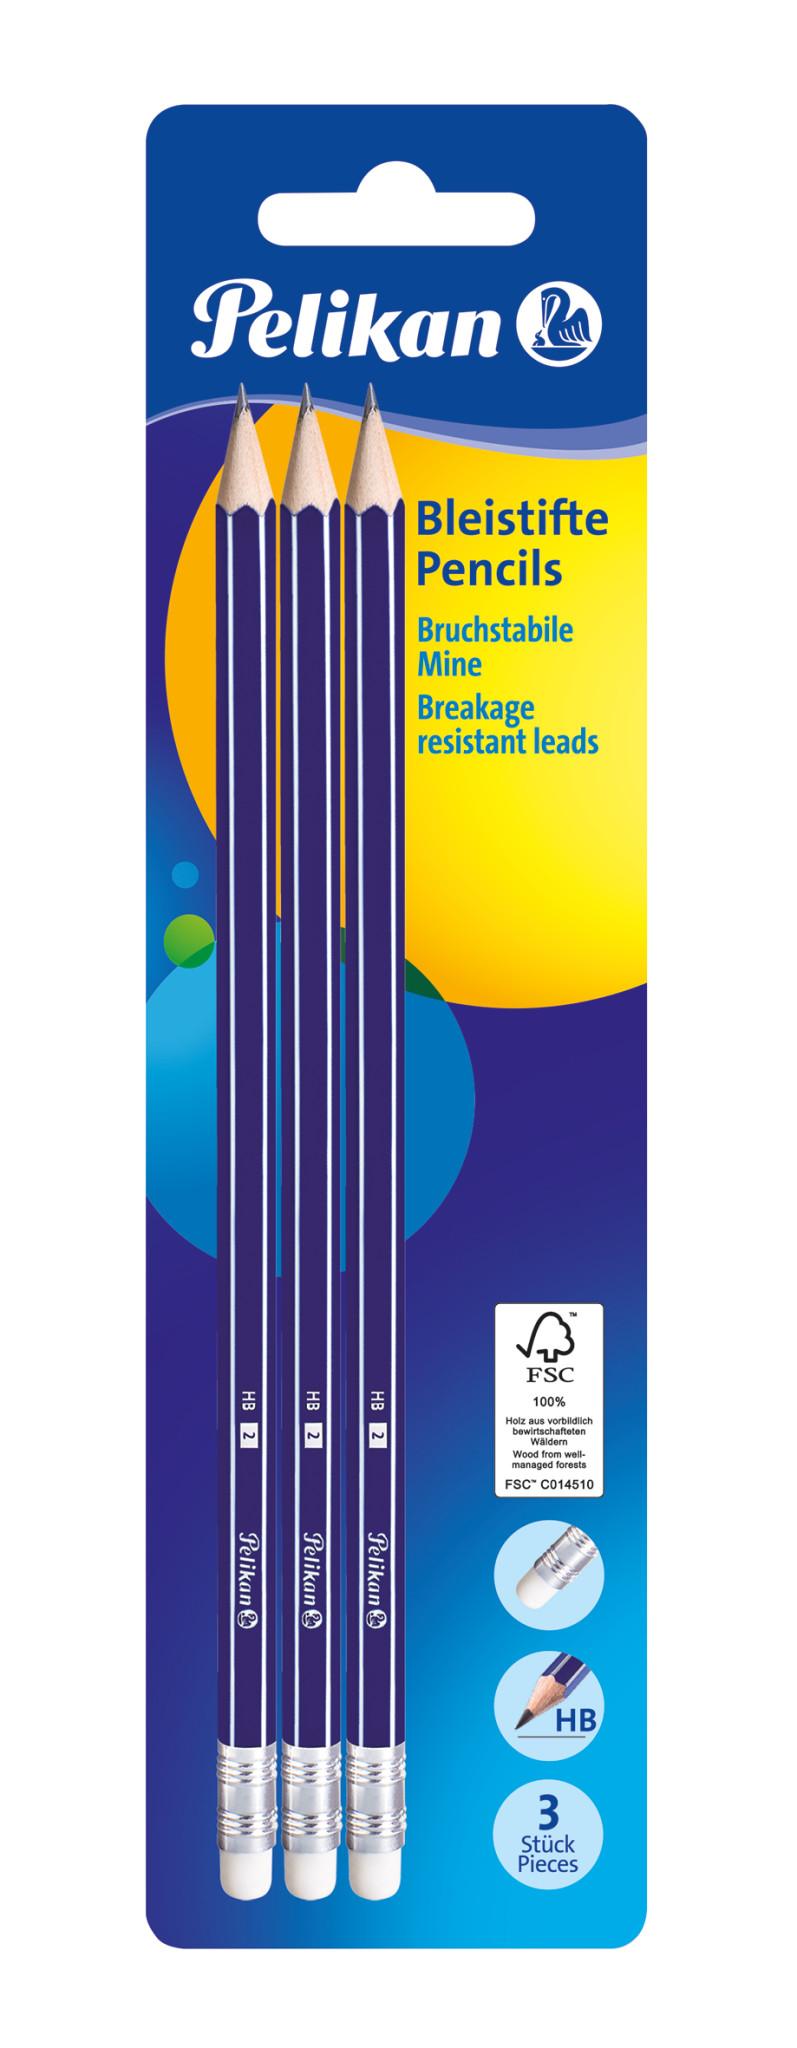 Pelikan 978866 - Bleistifte - HB - Radierer - 3 Stück